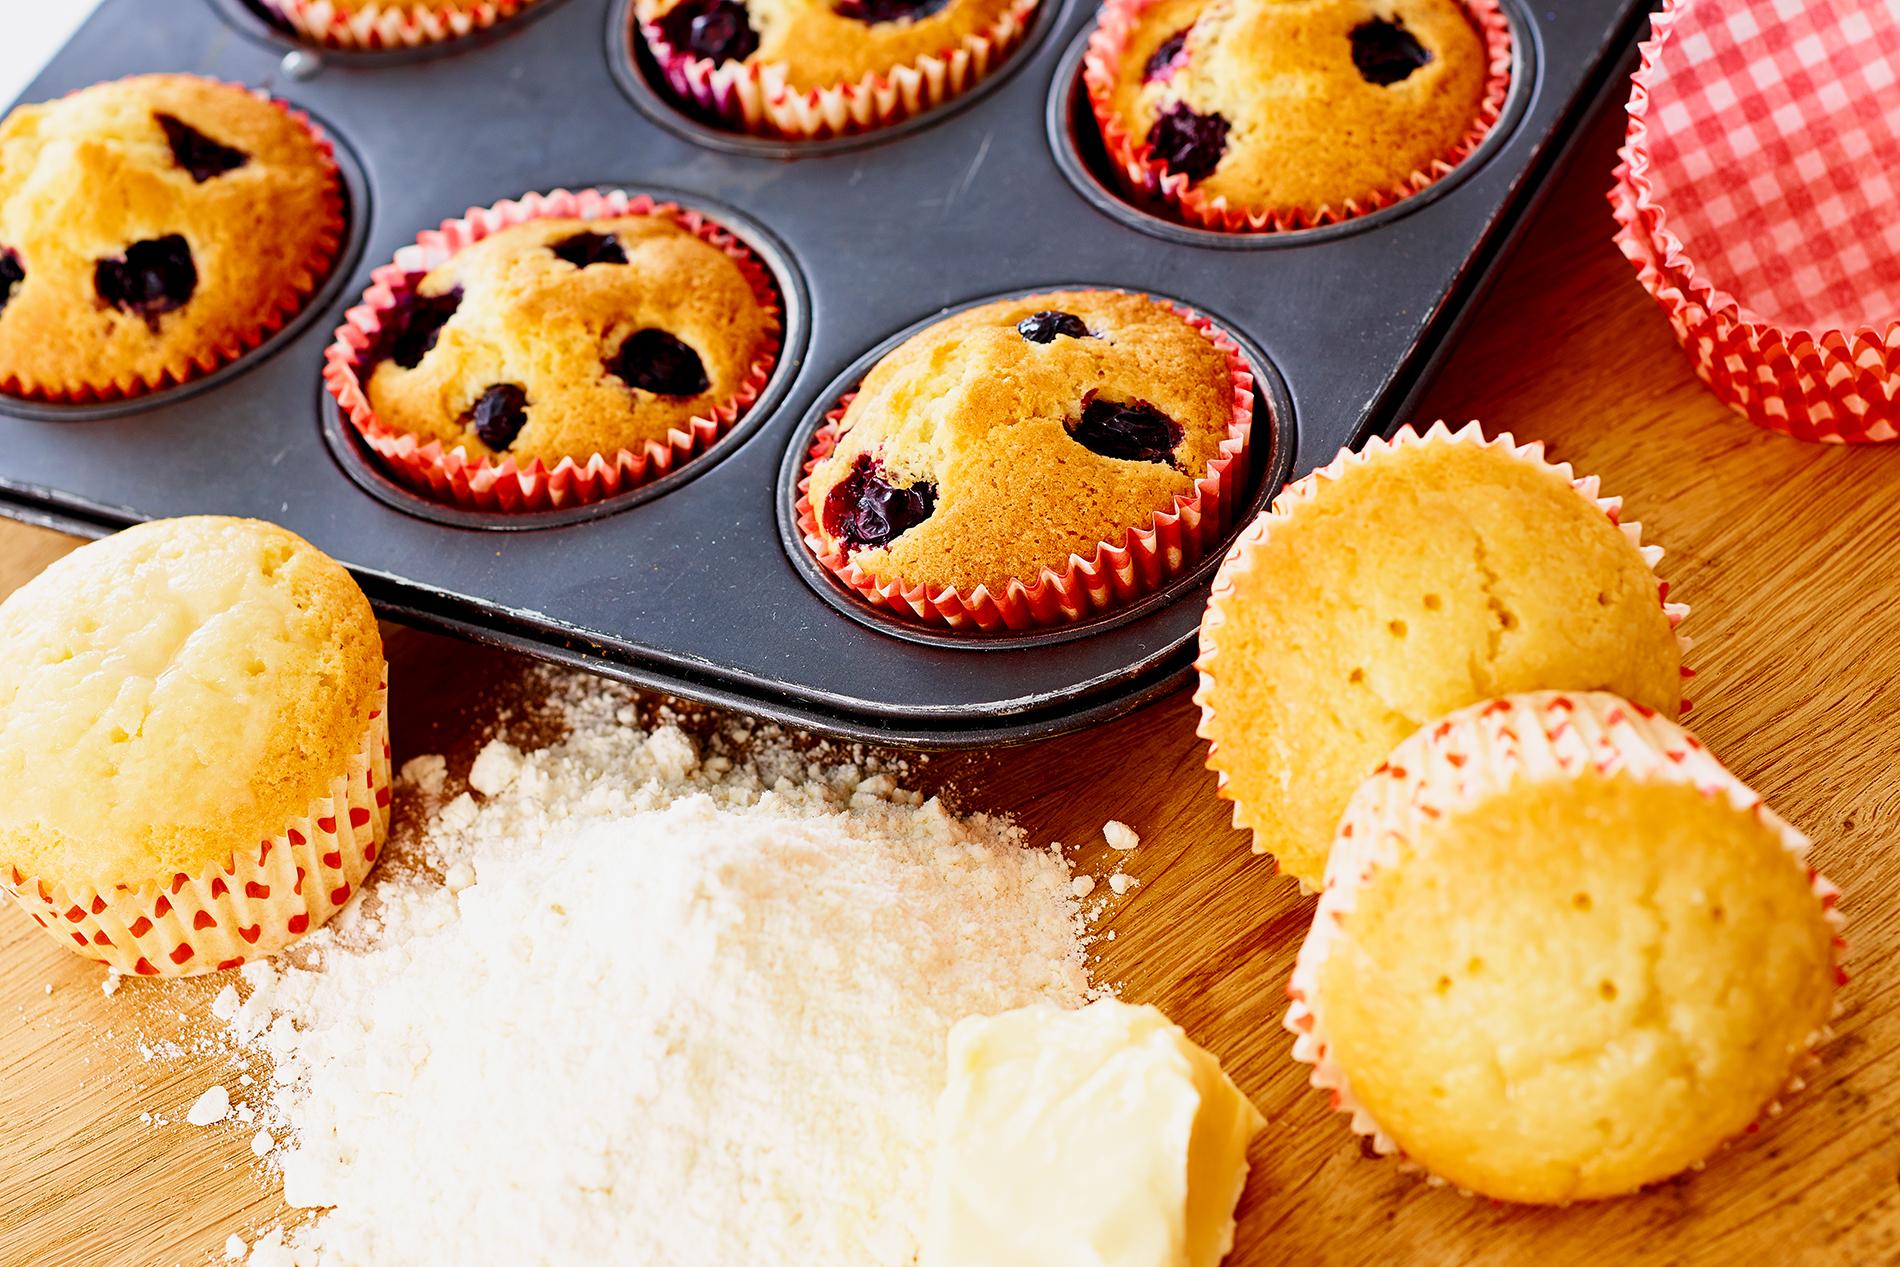 heidelbeer bananen muffins cookionista. Black Bedroom Furniture Sets. Home Design Ideas